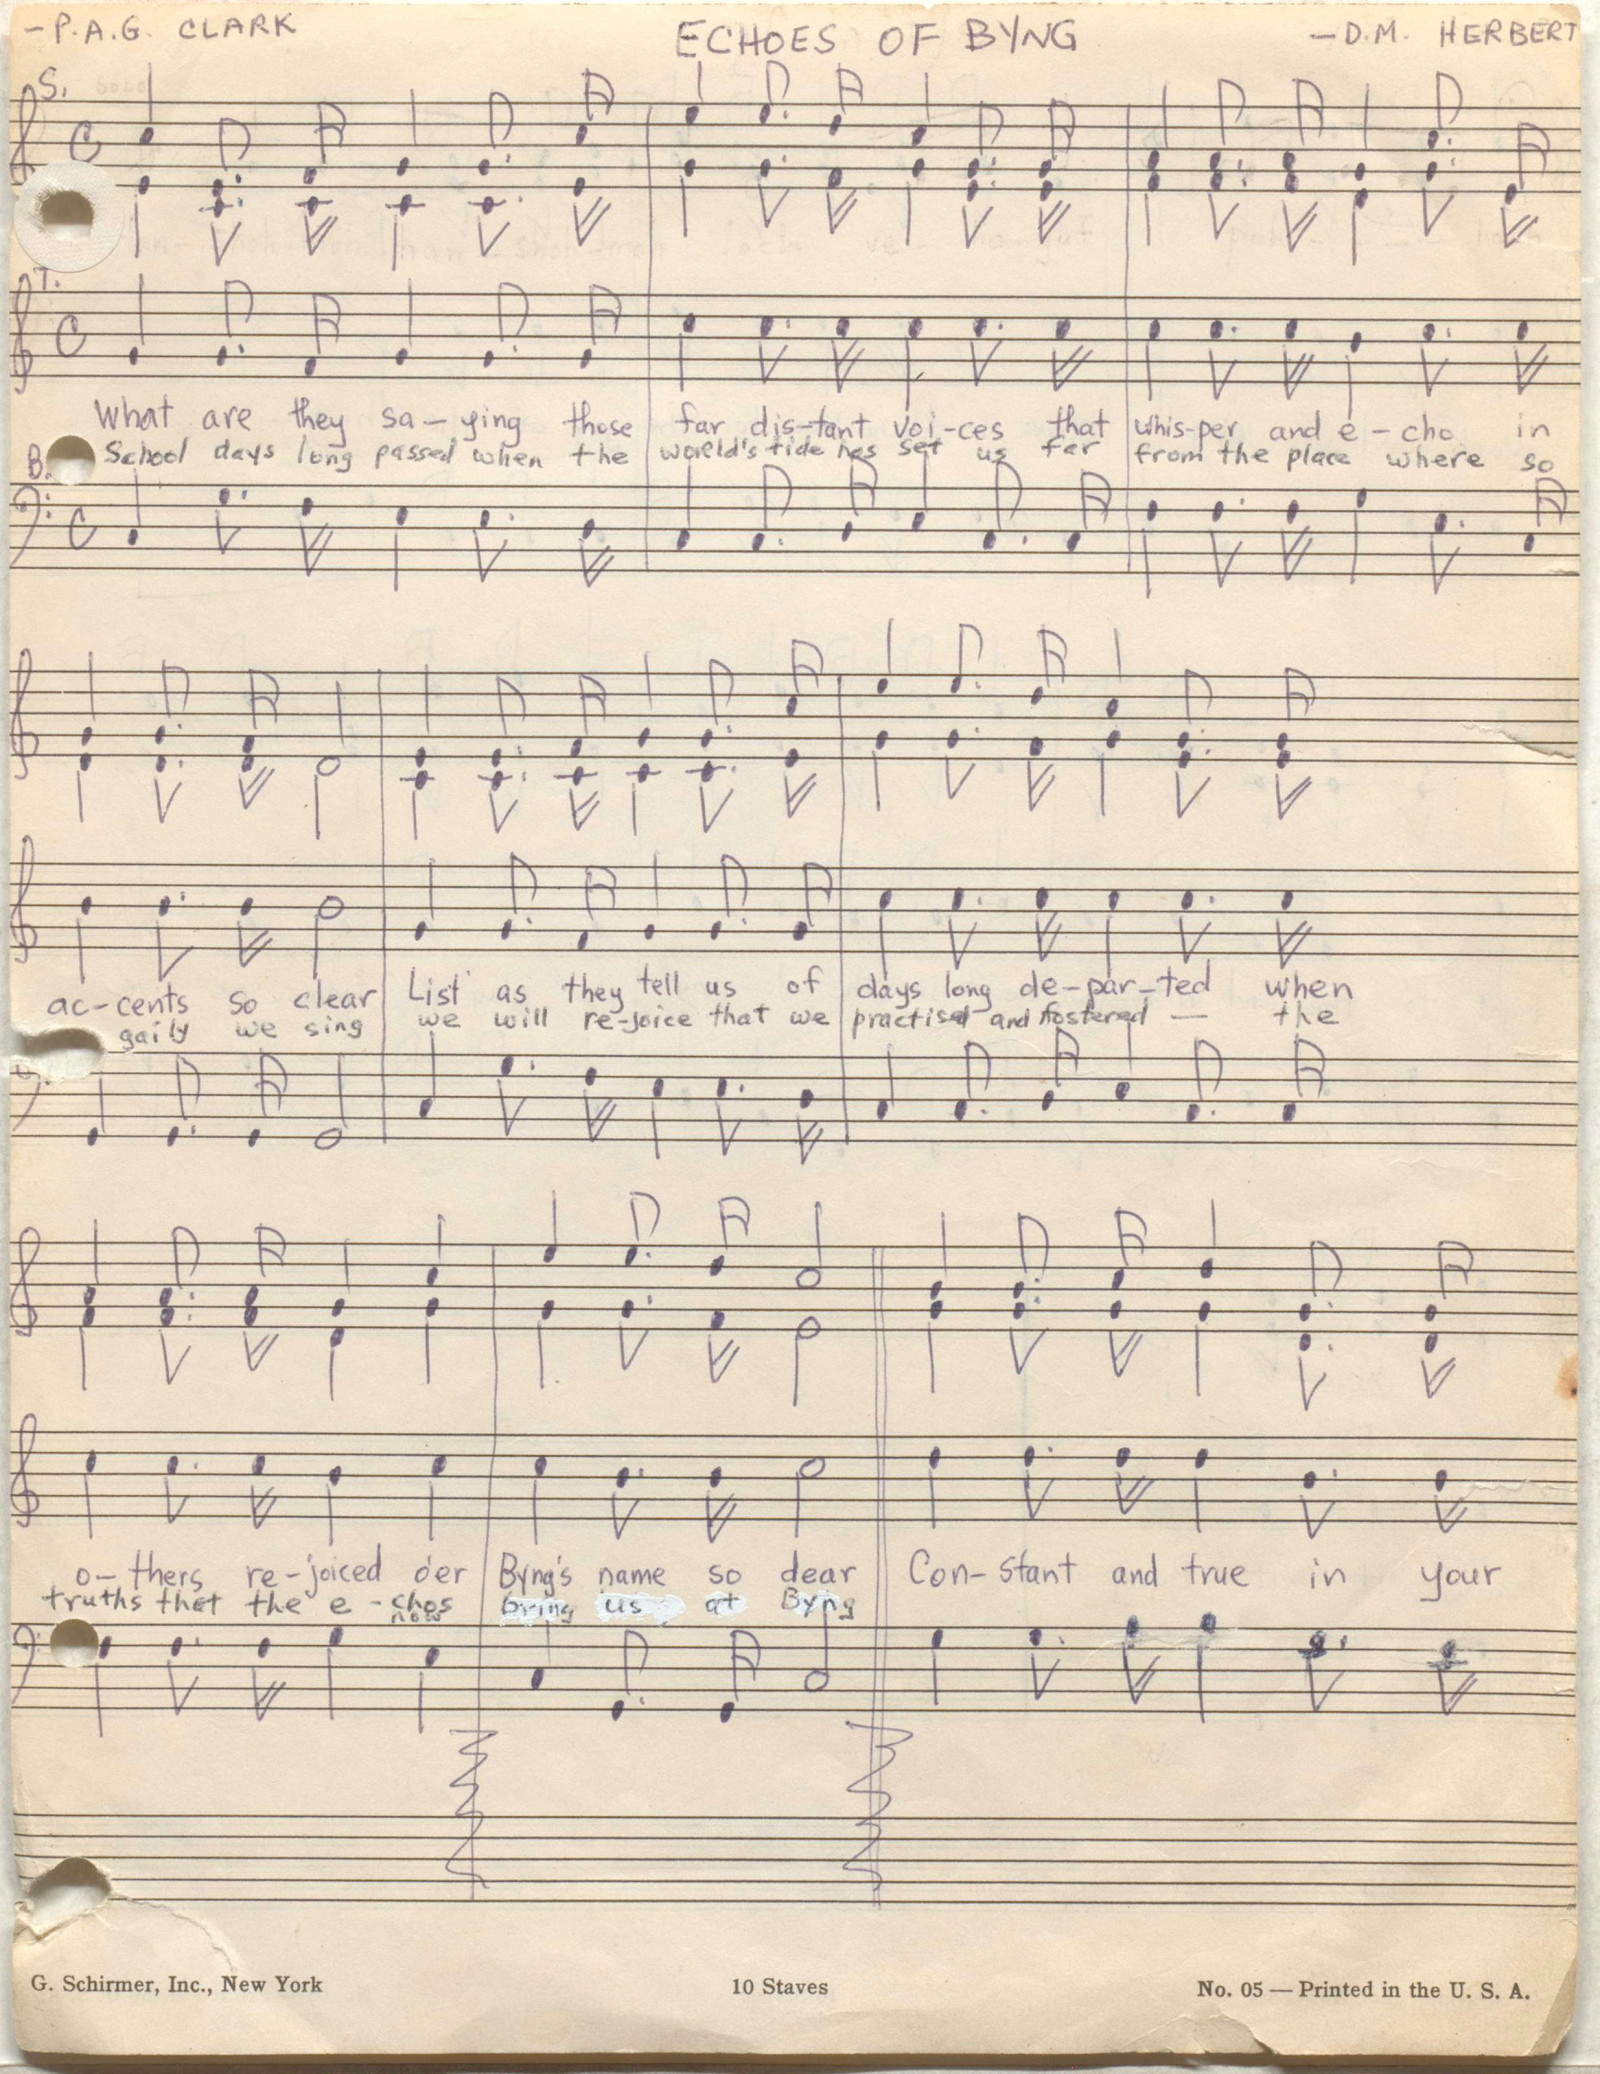 "Original score, ""Echoes of Byng"" ca. 1930"